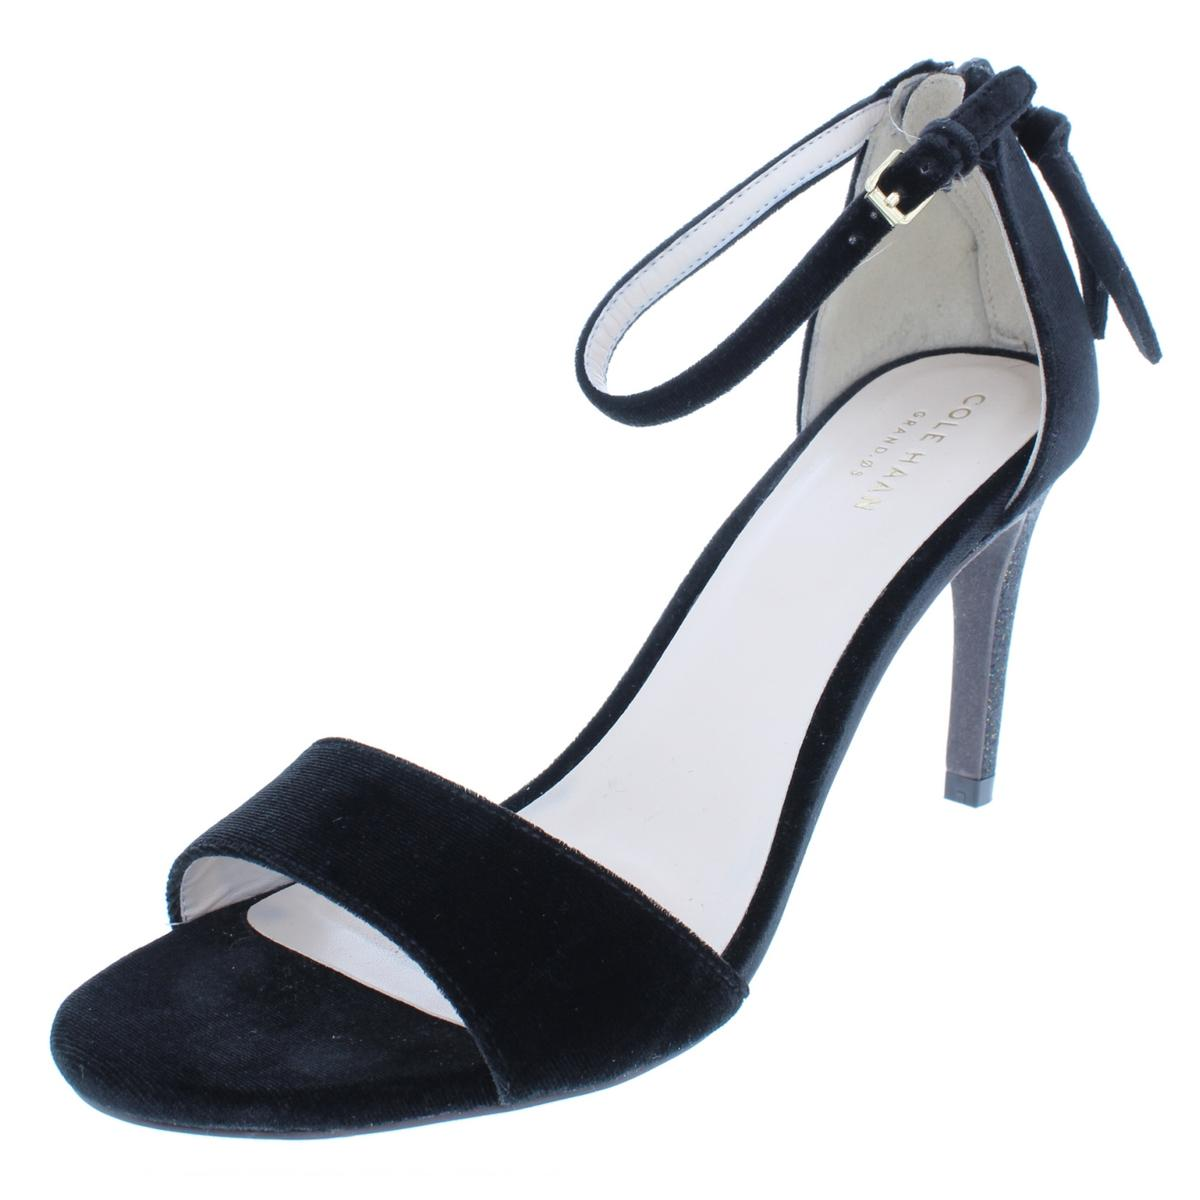 ef1e75f8ad60 Details about Cole Haan Womens Clara Grand Sandal 85mm Black Dress Sandals  7 Medium (B